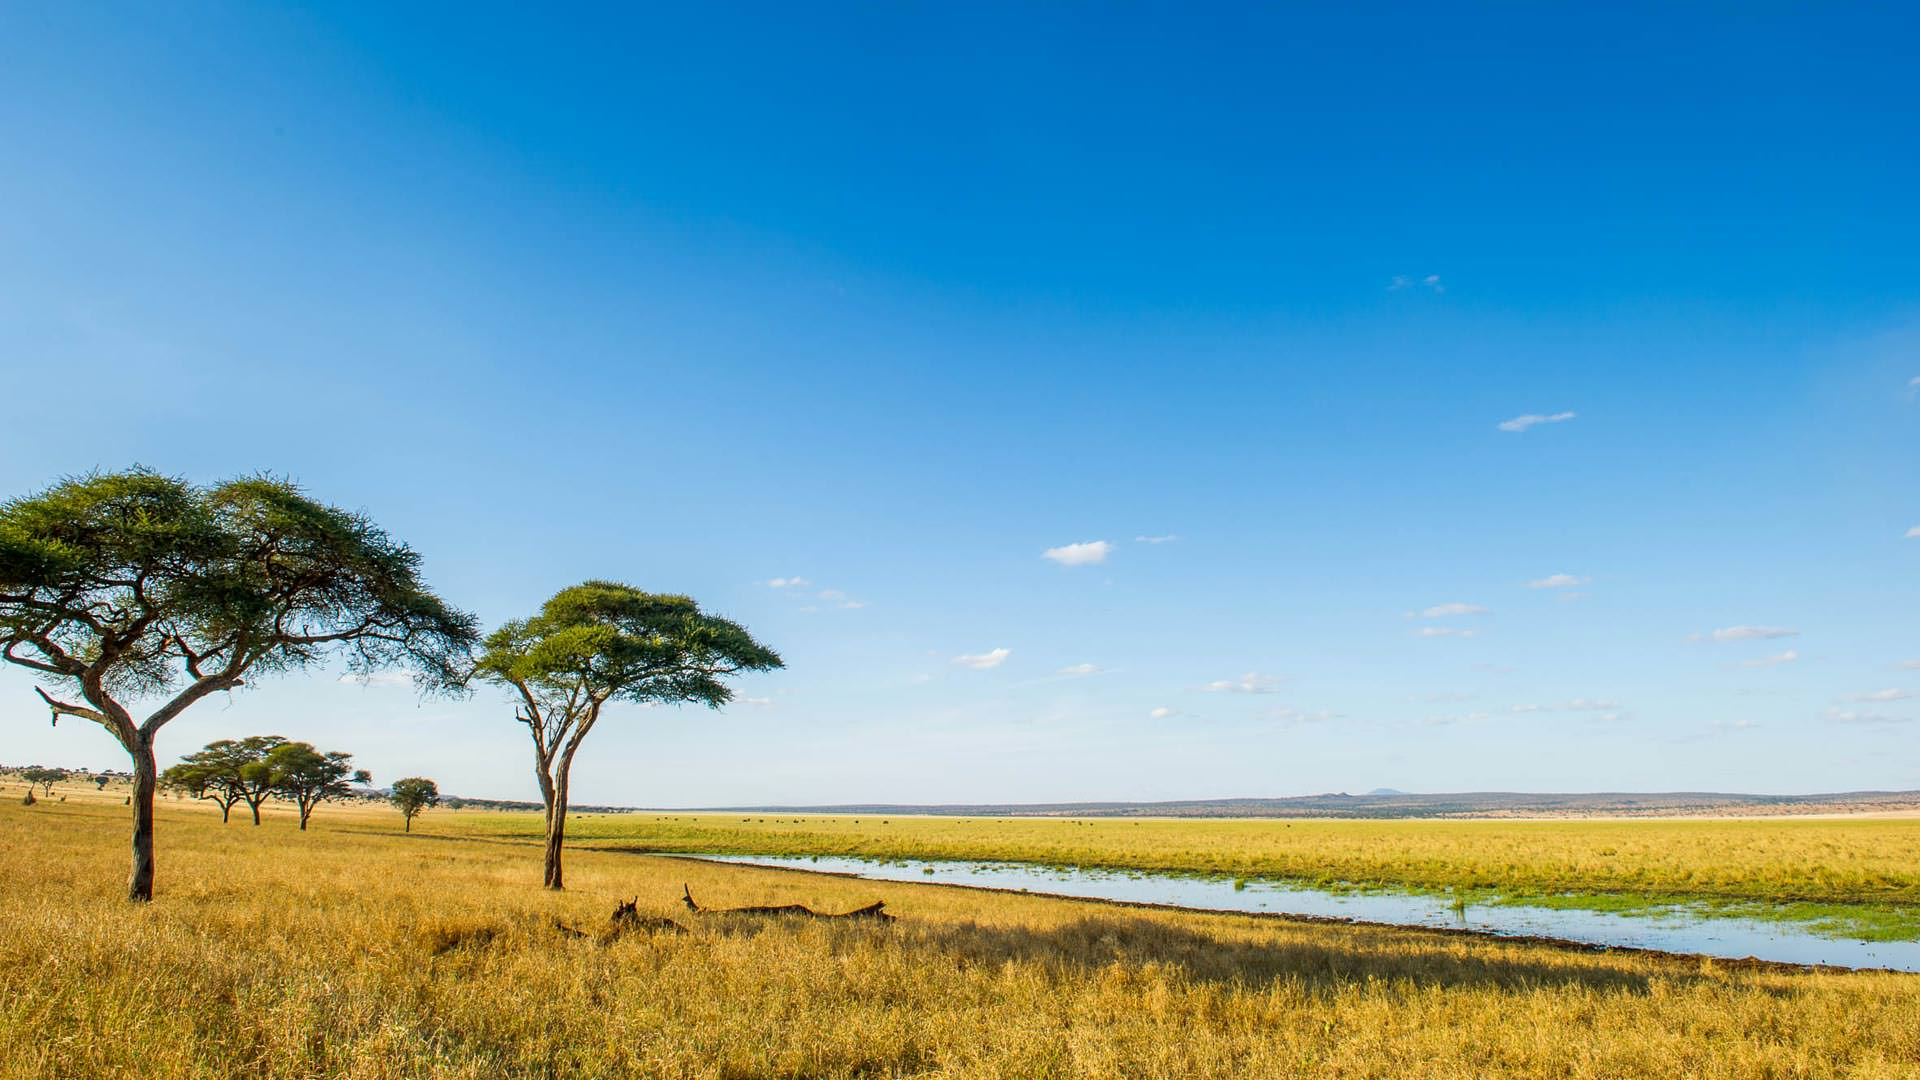 Silalei swamps in Tarangire